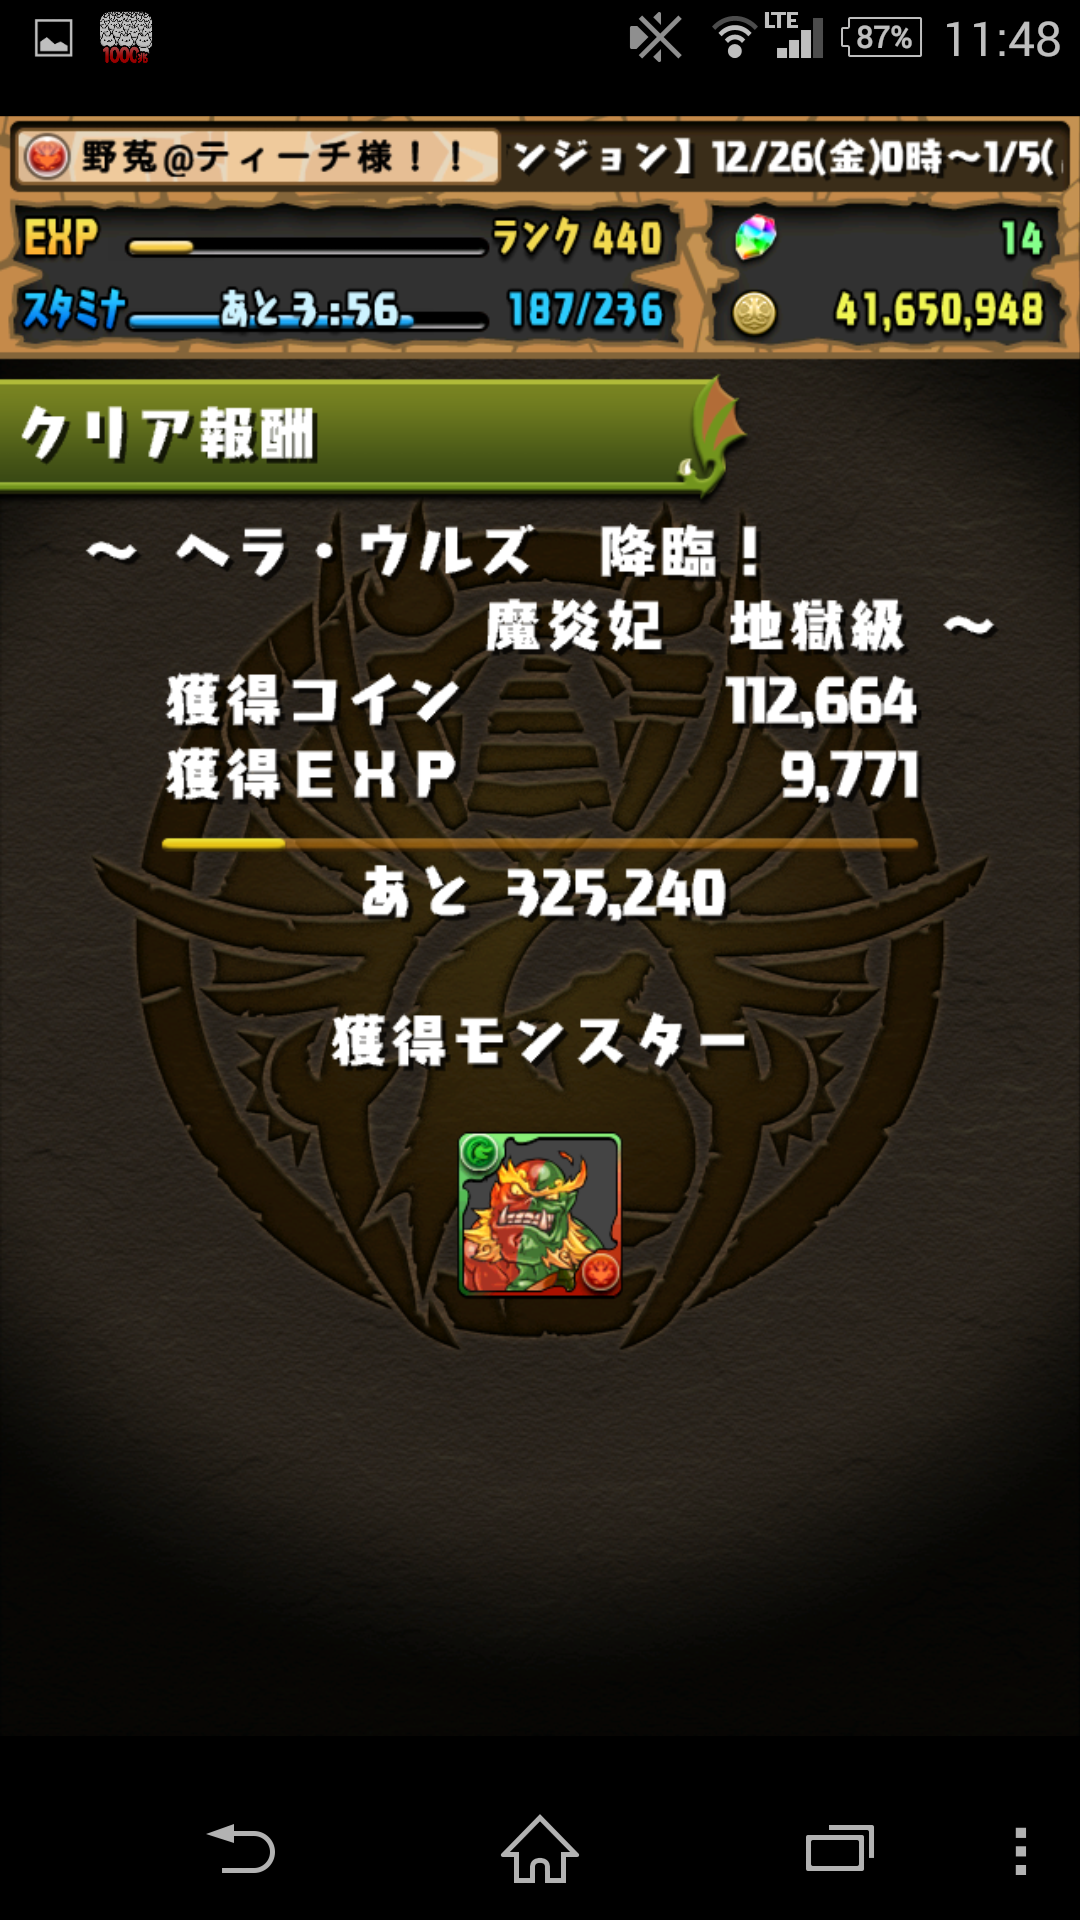 Screenshot_2015-01-03-11-48-57.png